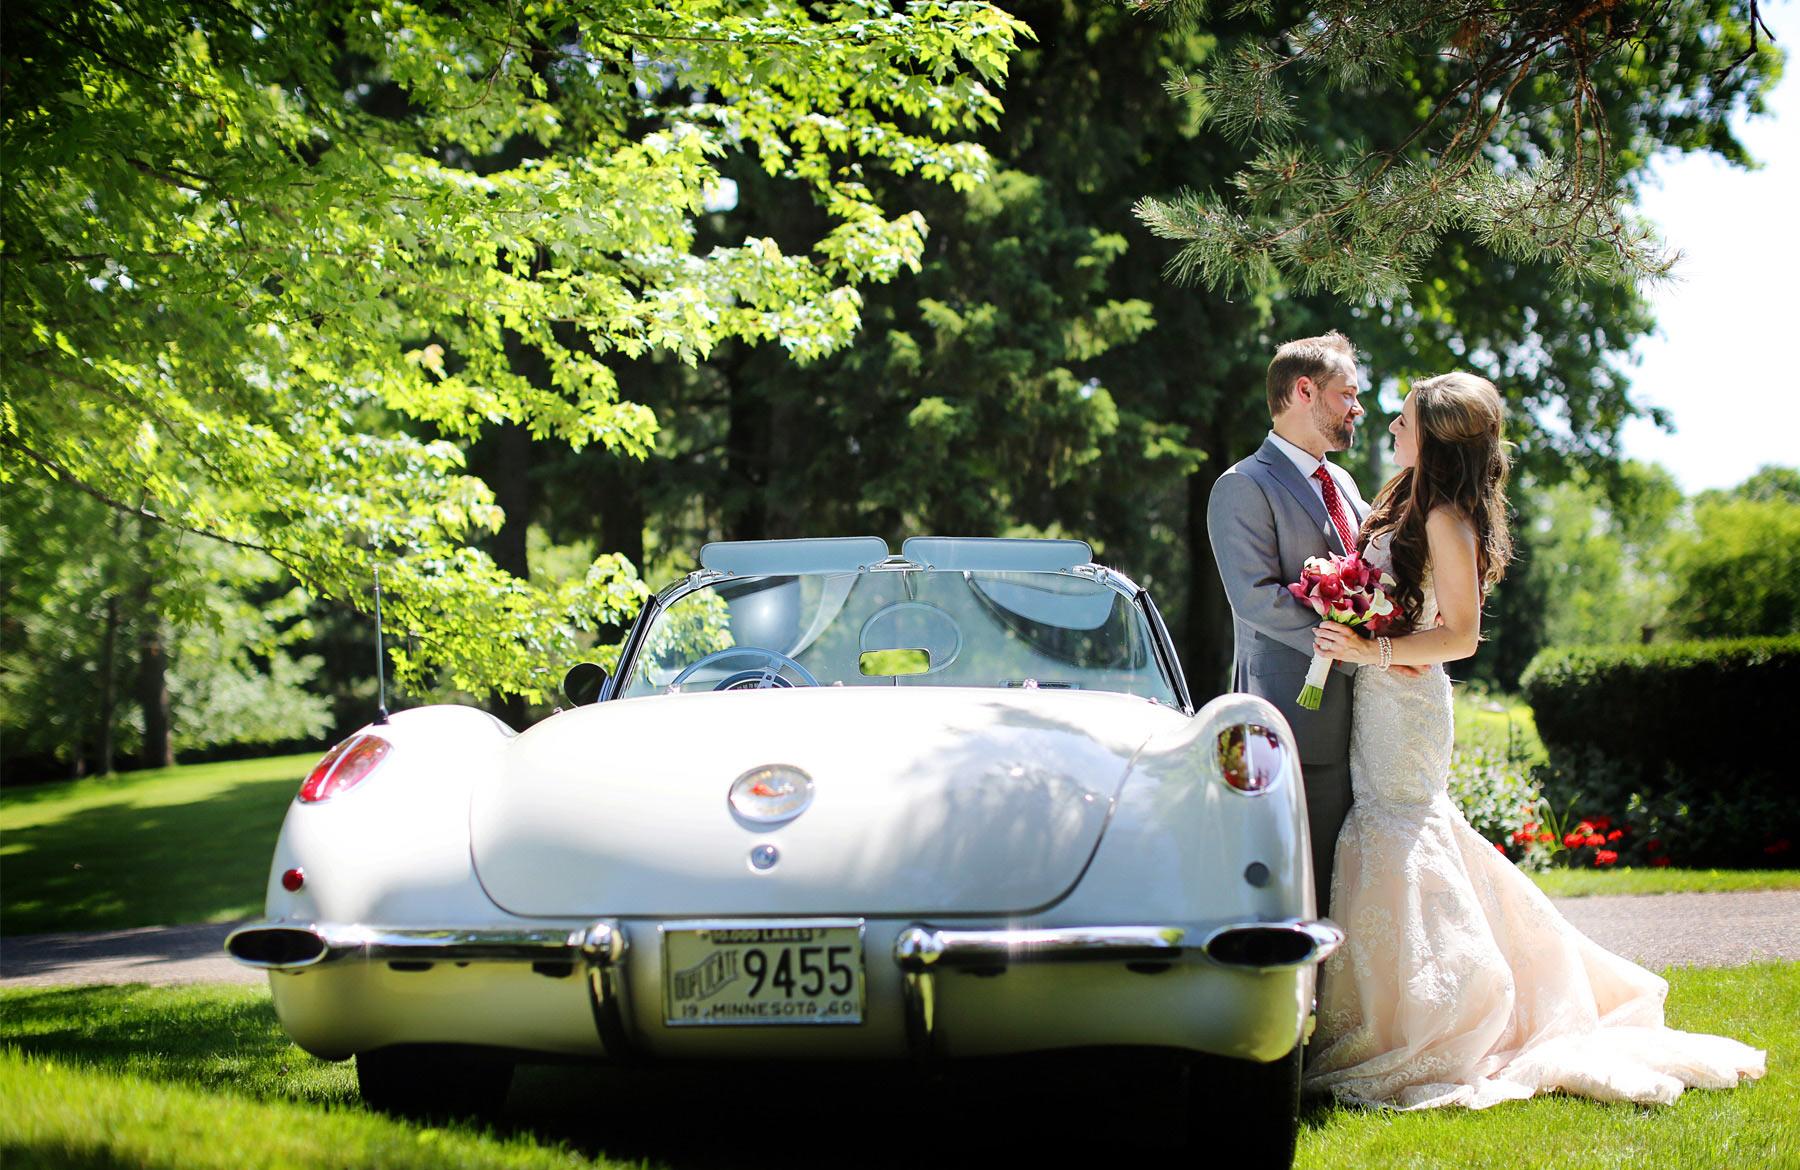 07-Minneapolis-Minnesota-Wedding-Photographer-by-Andrew-Vick-Photography-Summer-Edina-Classic-Car-Dress-Flowers-Bride-Groom-Natalie-and-Andrew.jpg